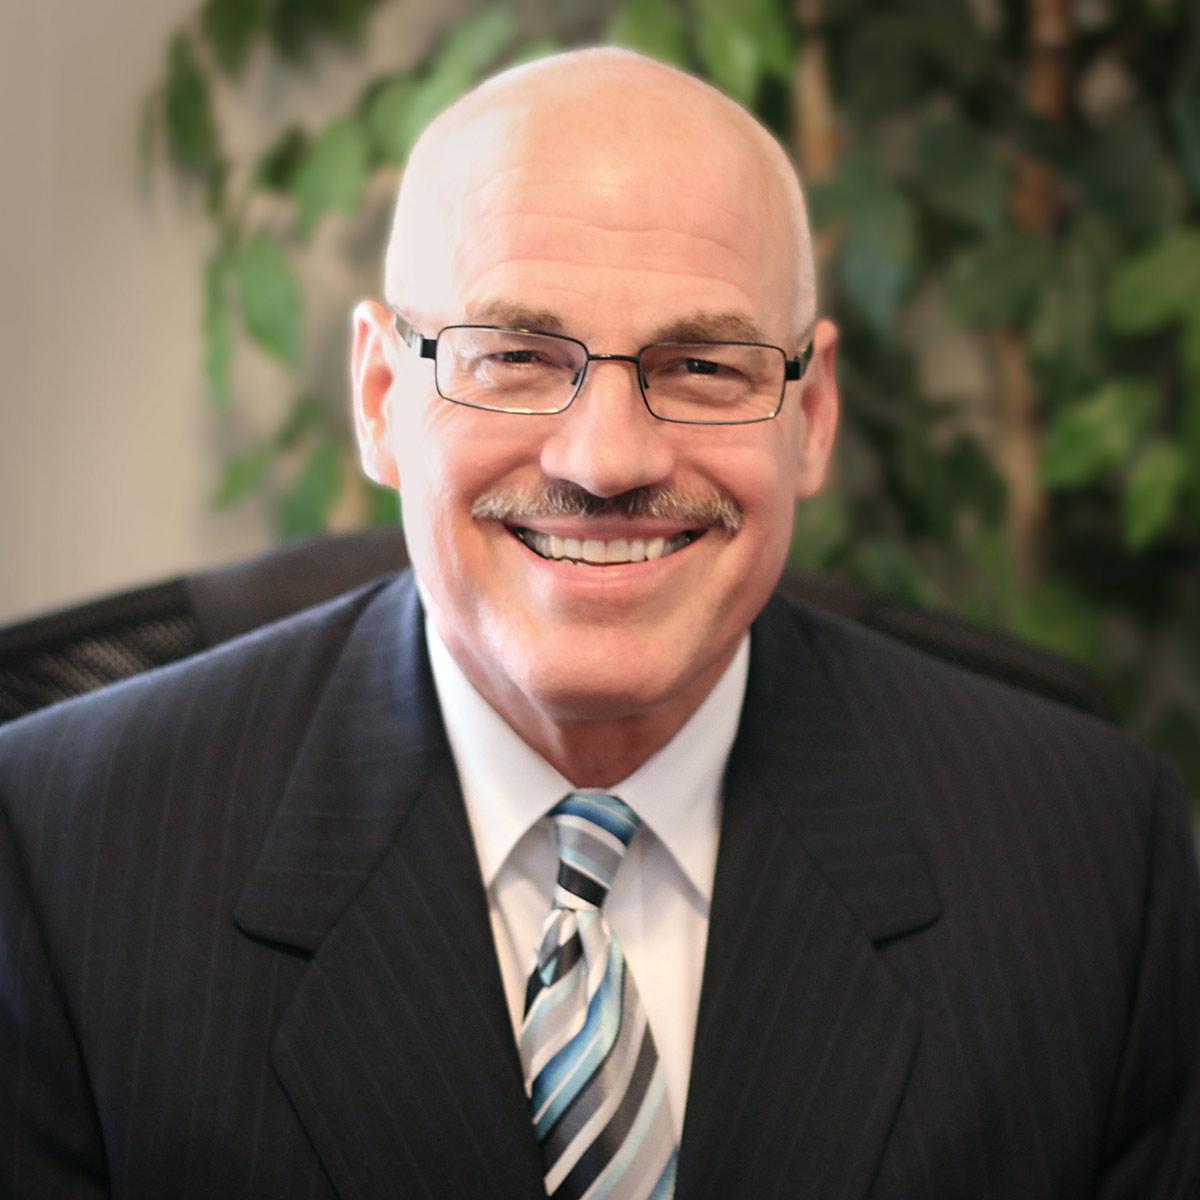 Jeff Levinson